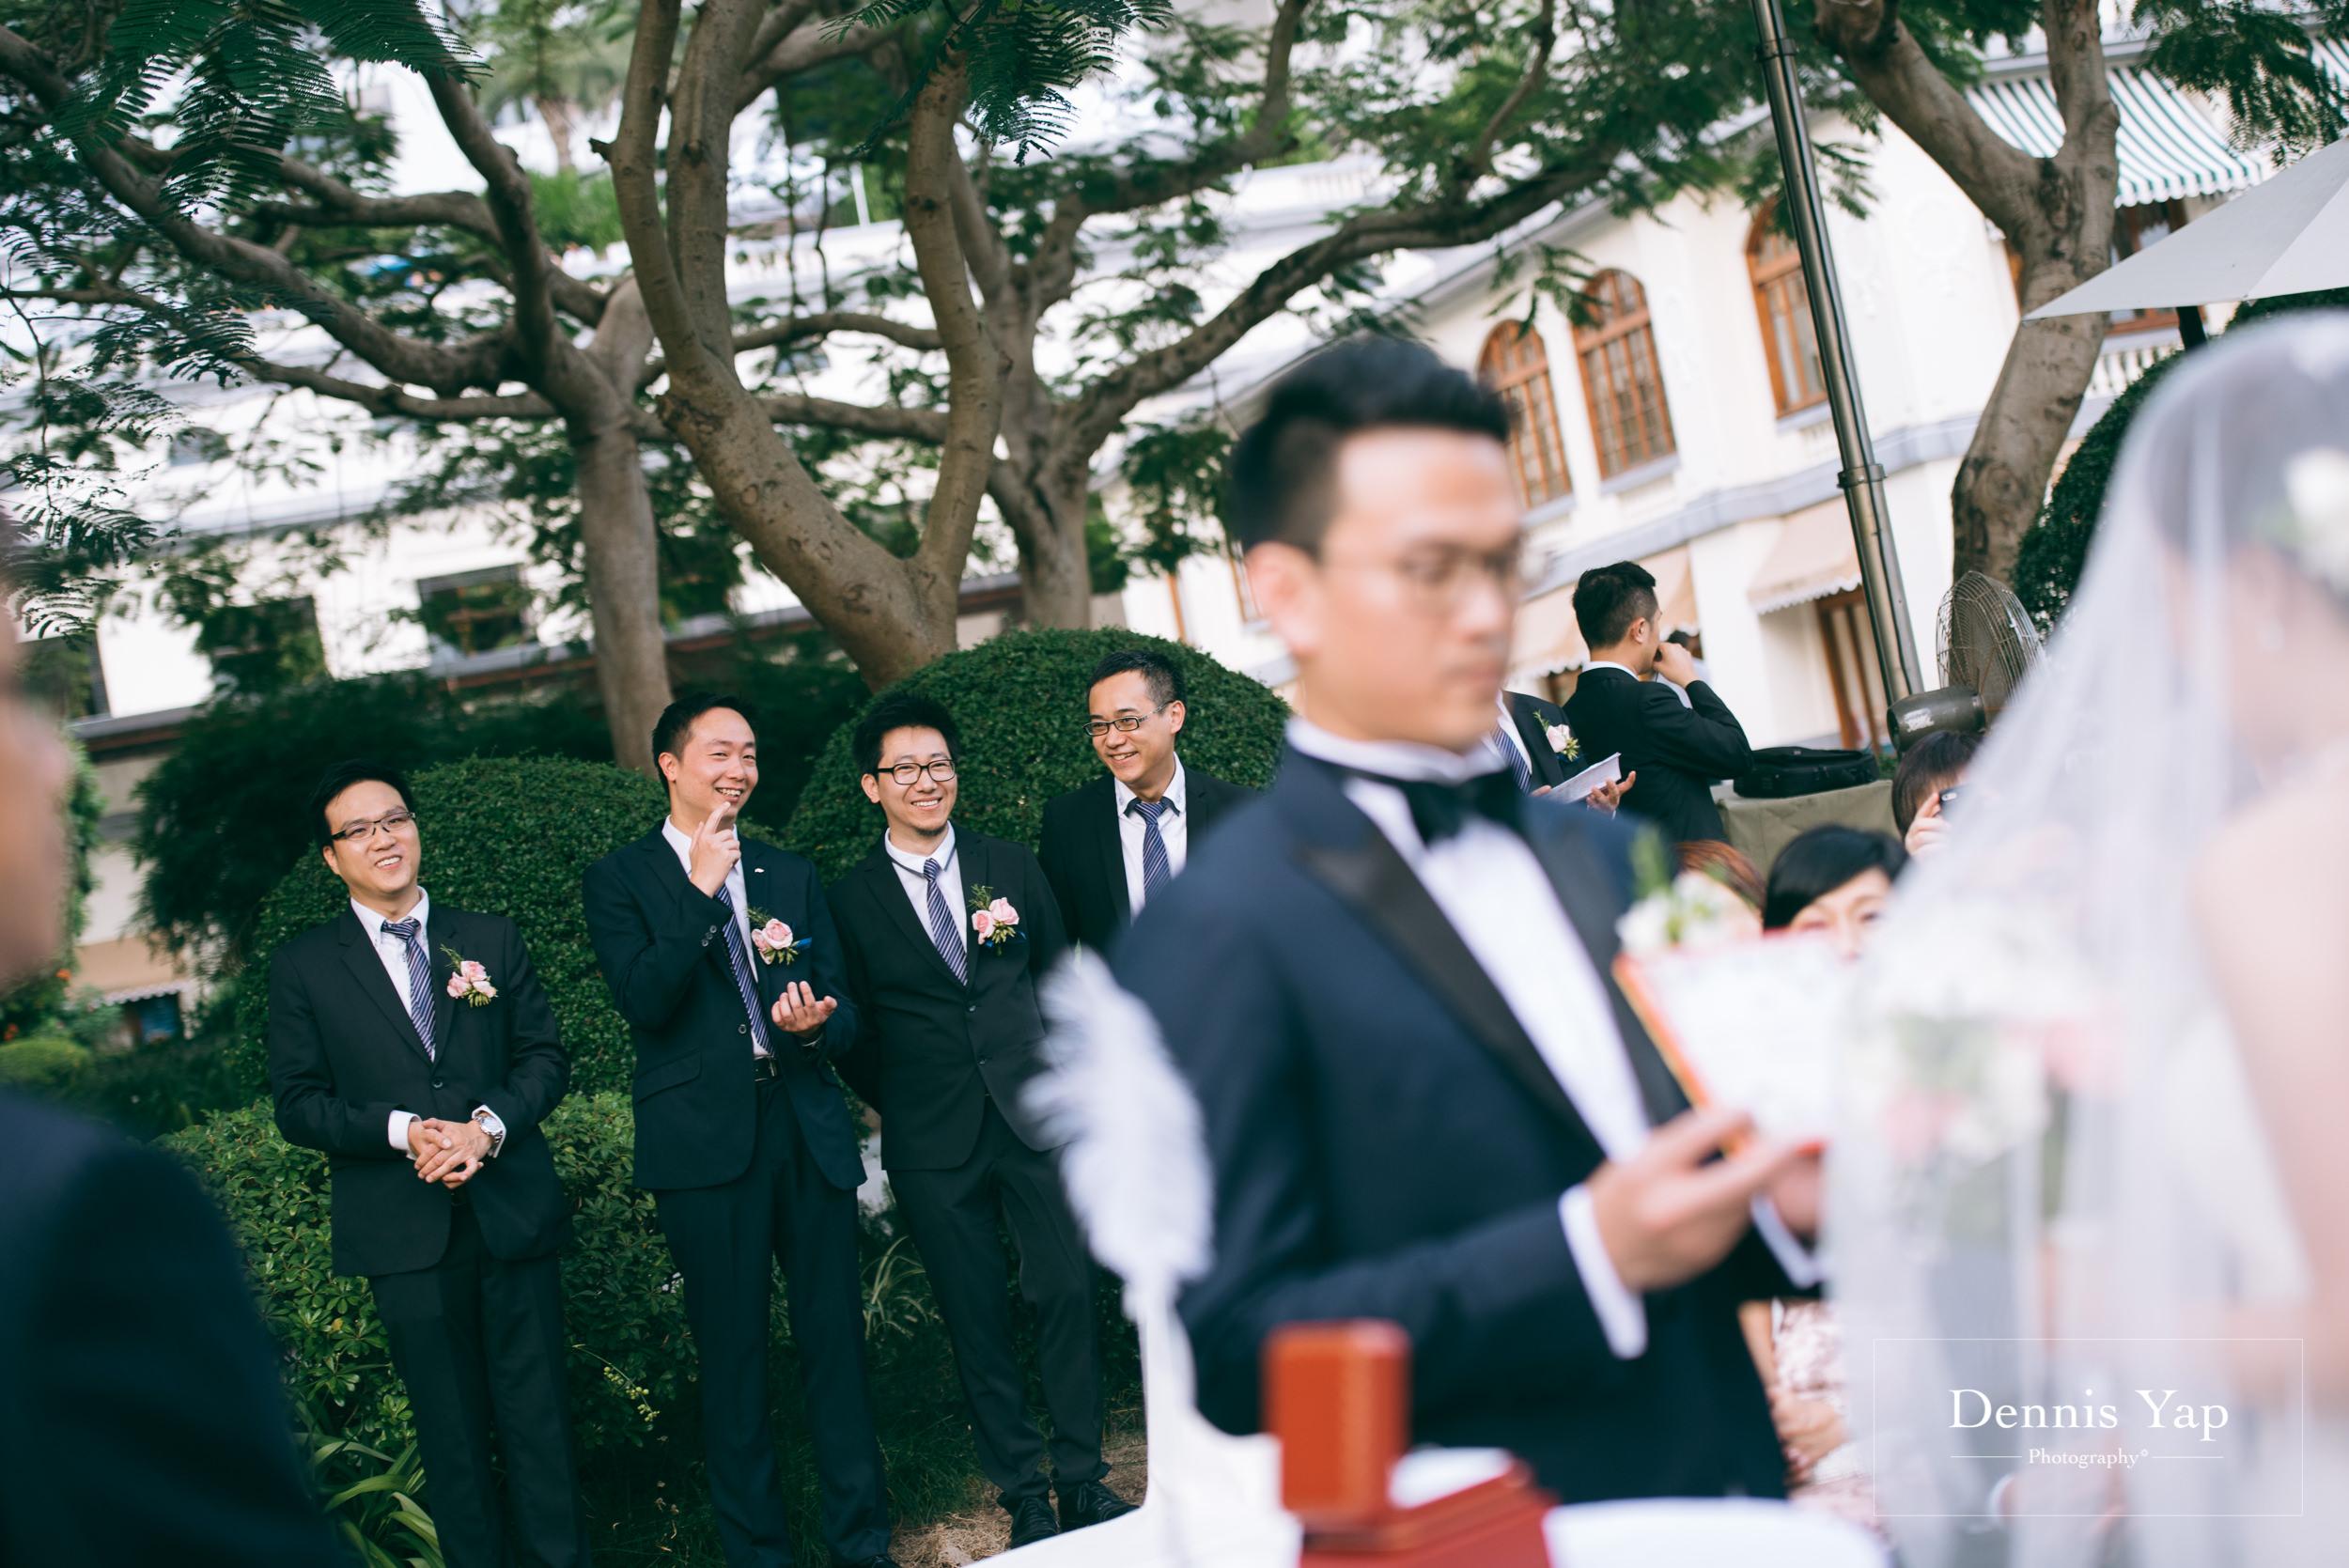 jason crystal wedding day gate crash hong kong garden wedding dennis yap photography-29.jpg